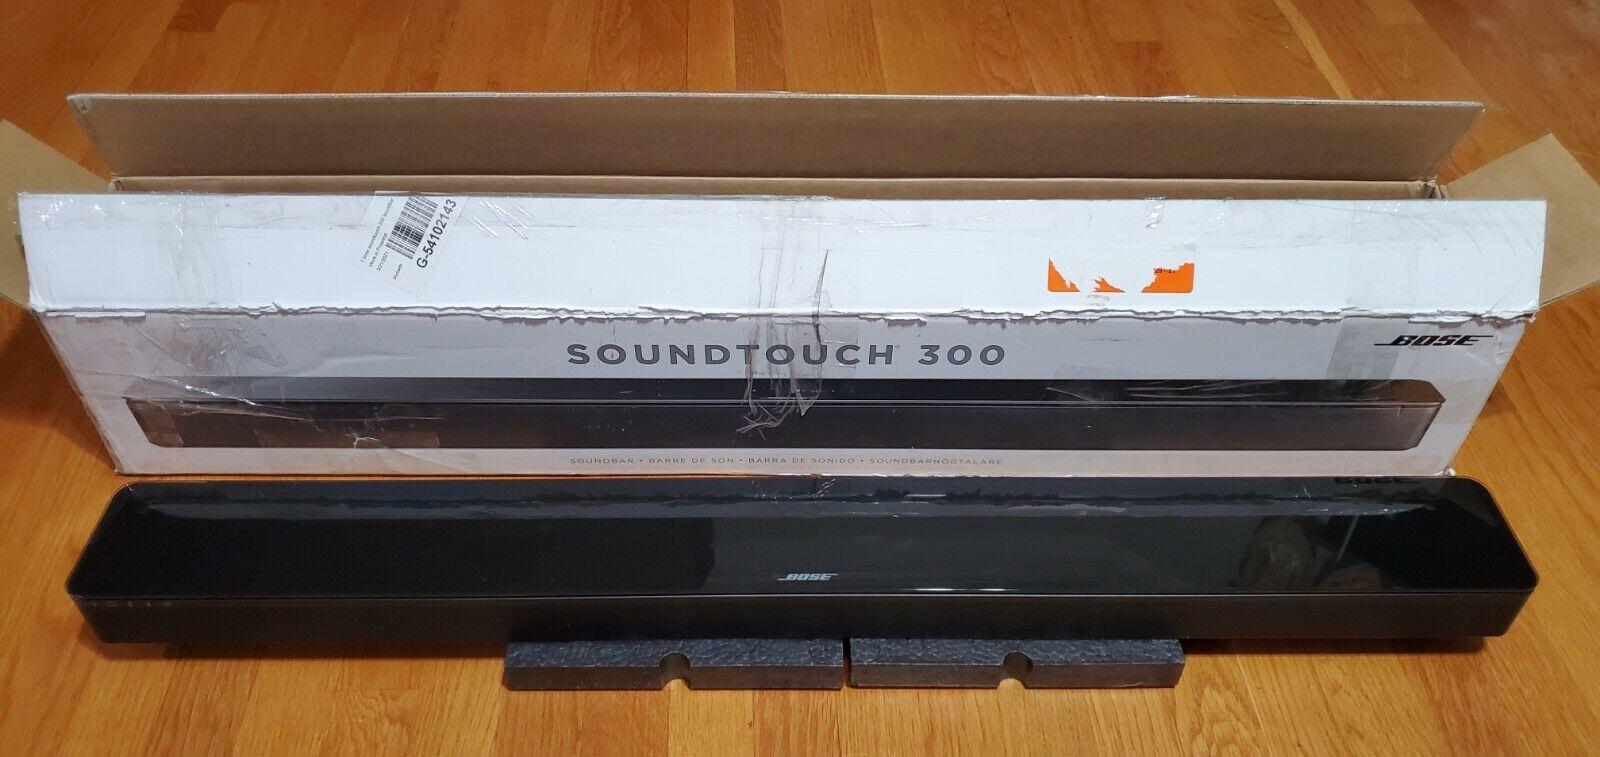 Genuine Bose Sound Touch 300 Soundbar (NO Remote Control). Buy it now for 299.00